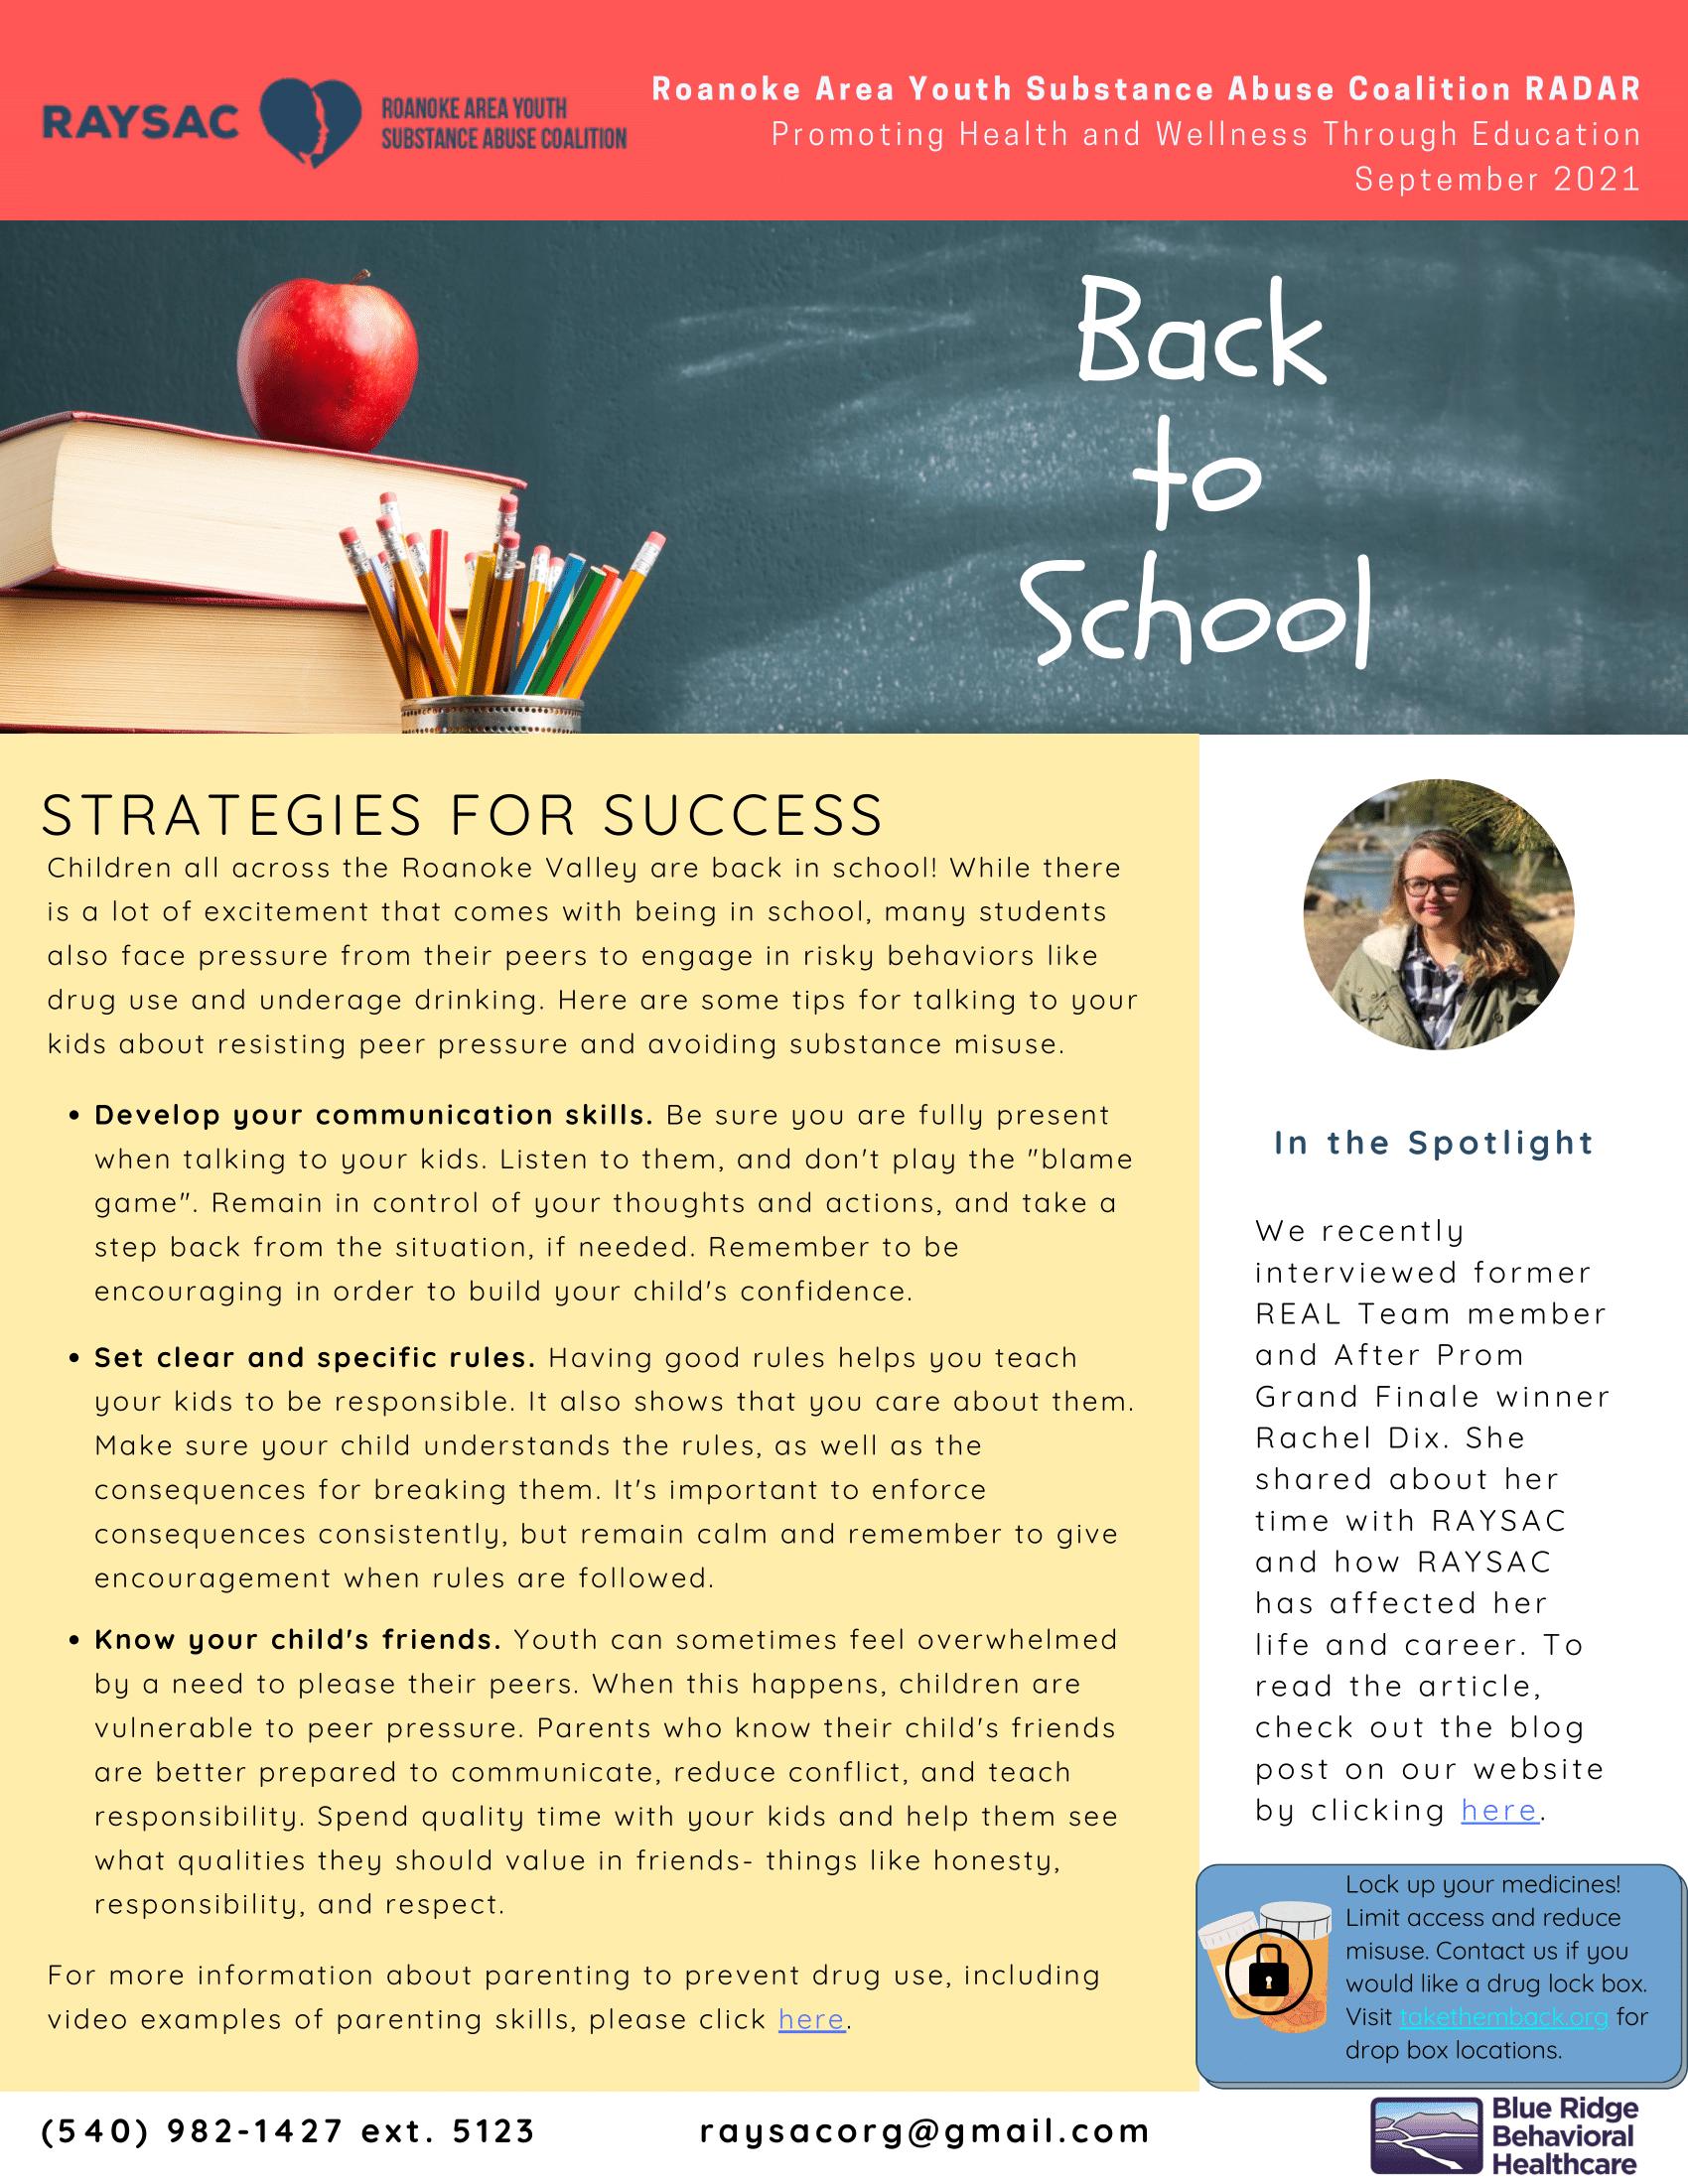 Back To School Strategies for Success-September 2021 RADAR